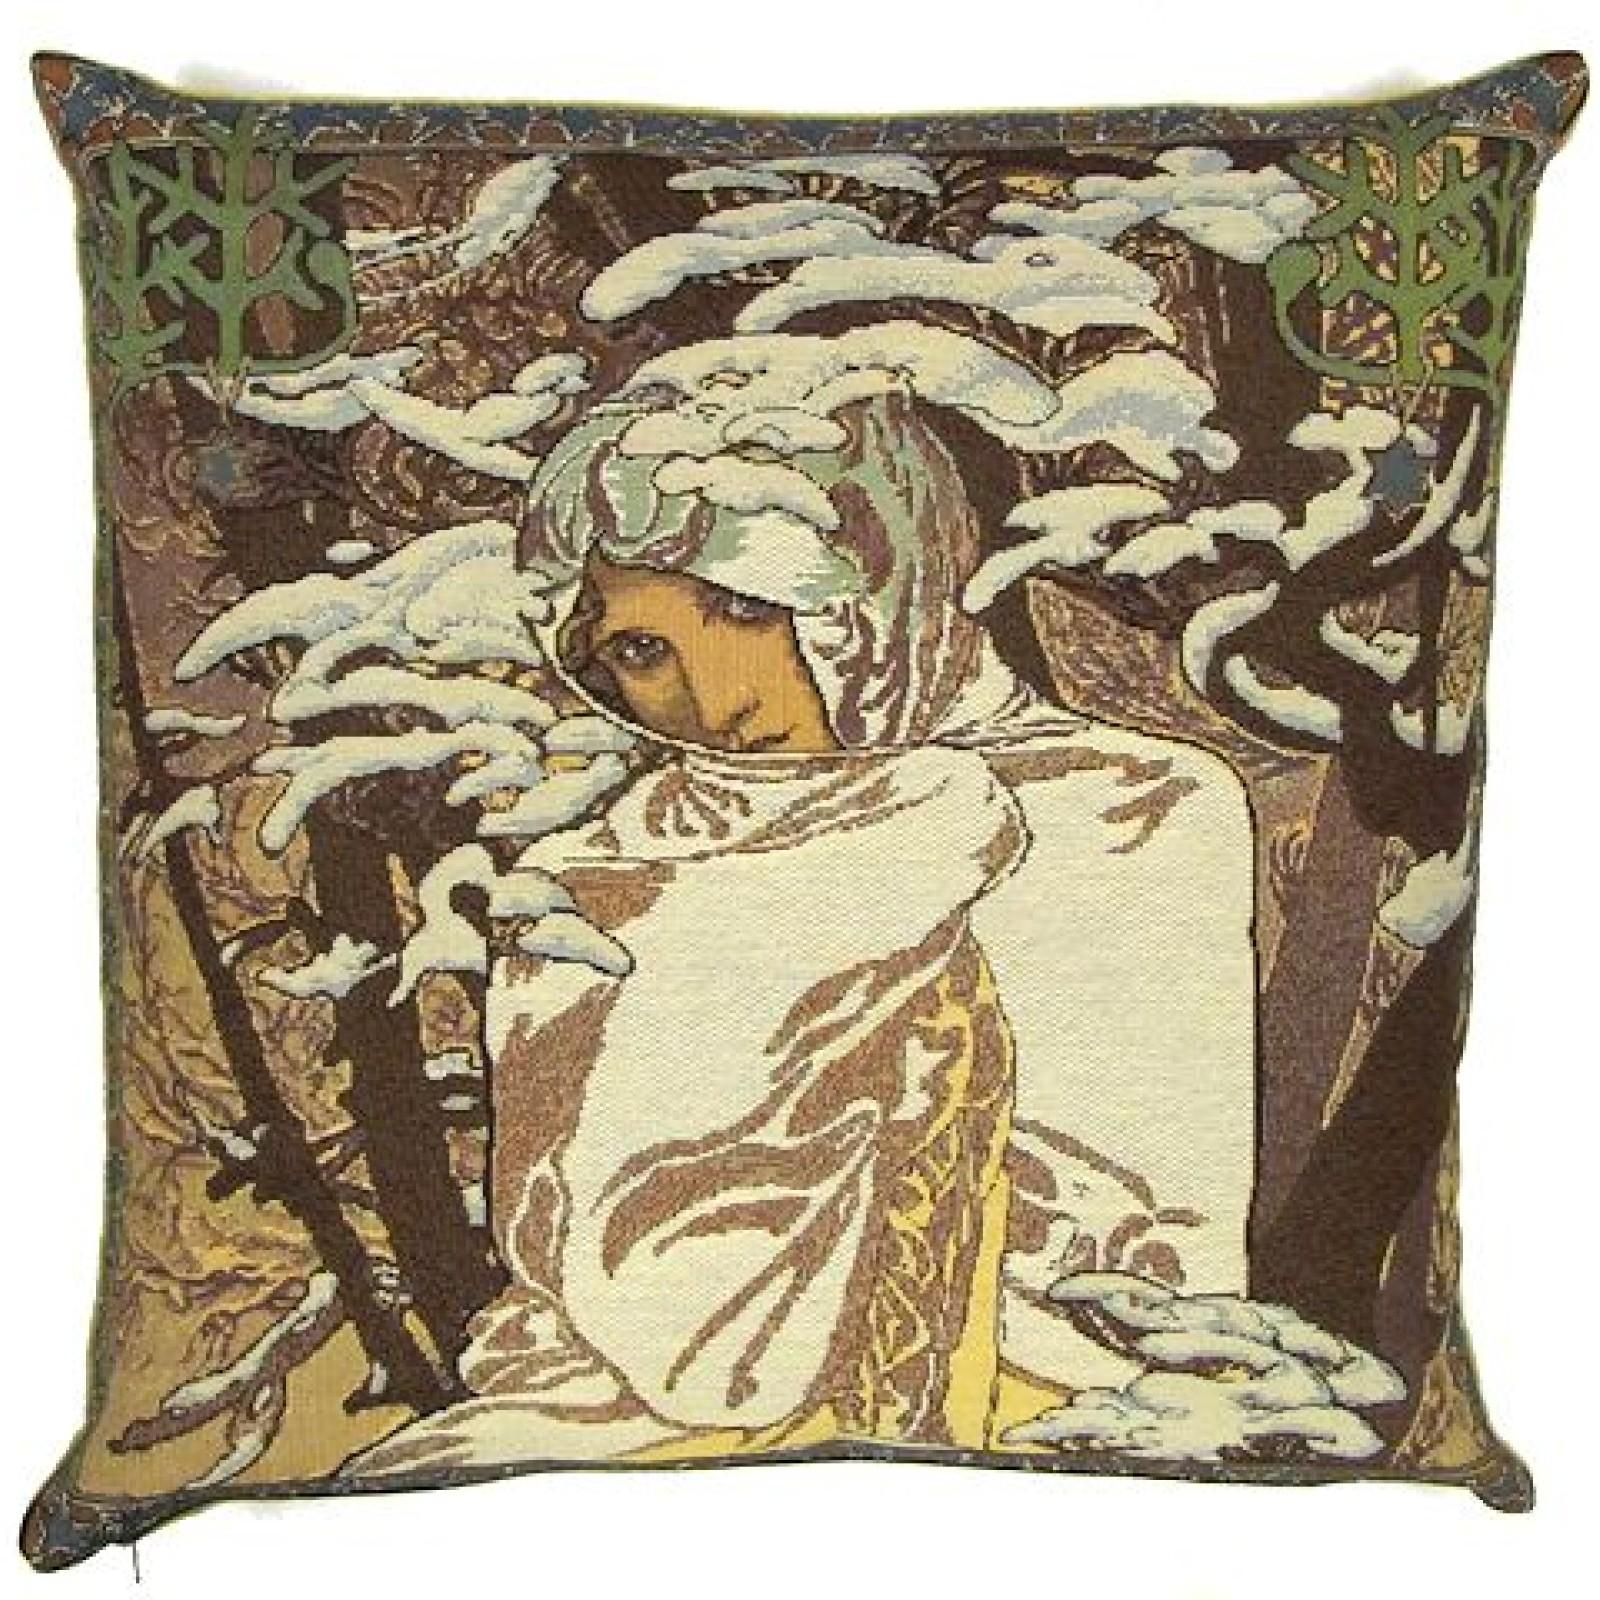 Massivt Gobelin pude - Alfons Mucha, Winter, 45x45cm - VILD MED SKIND Deco TT79